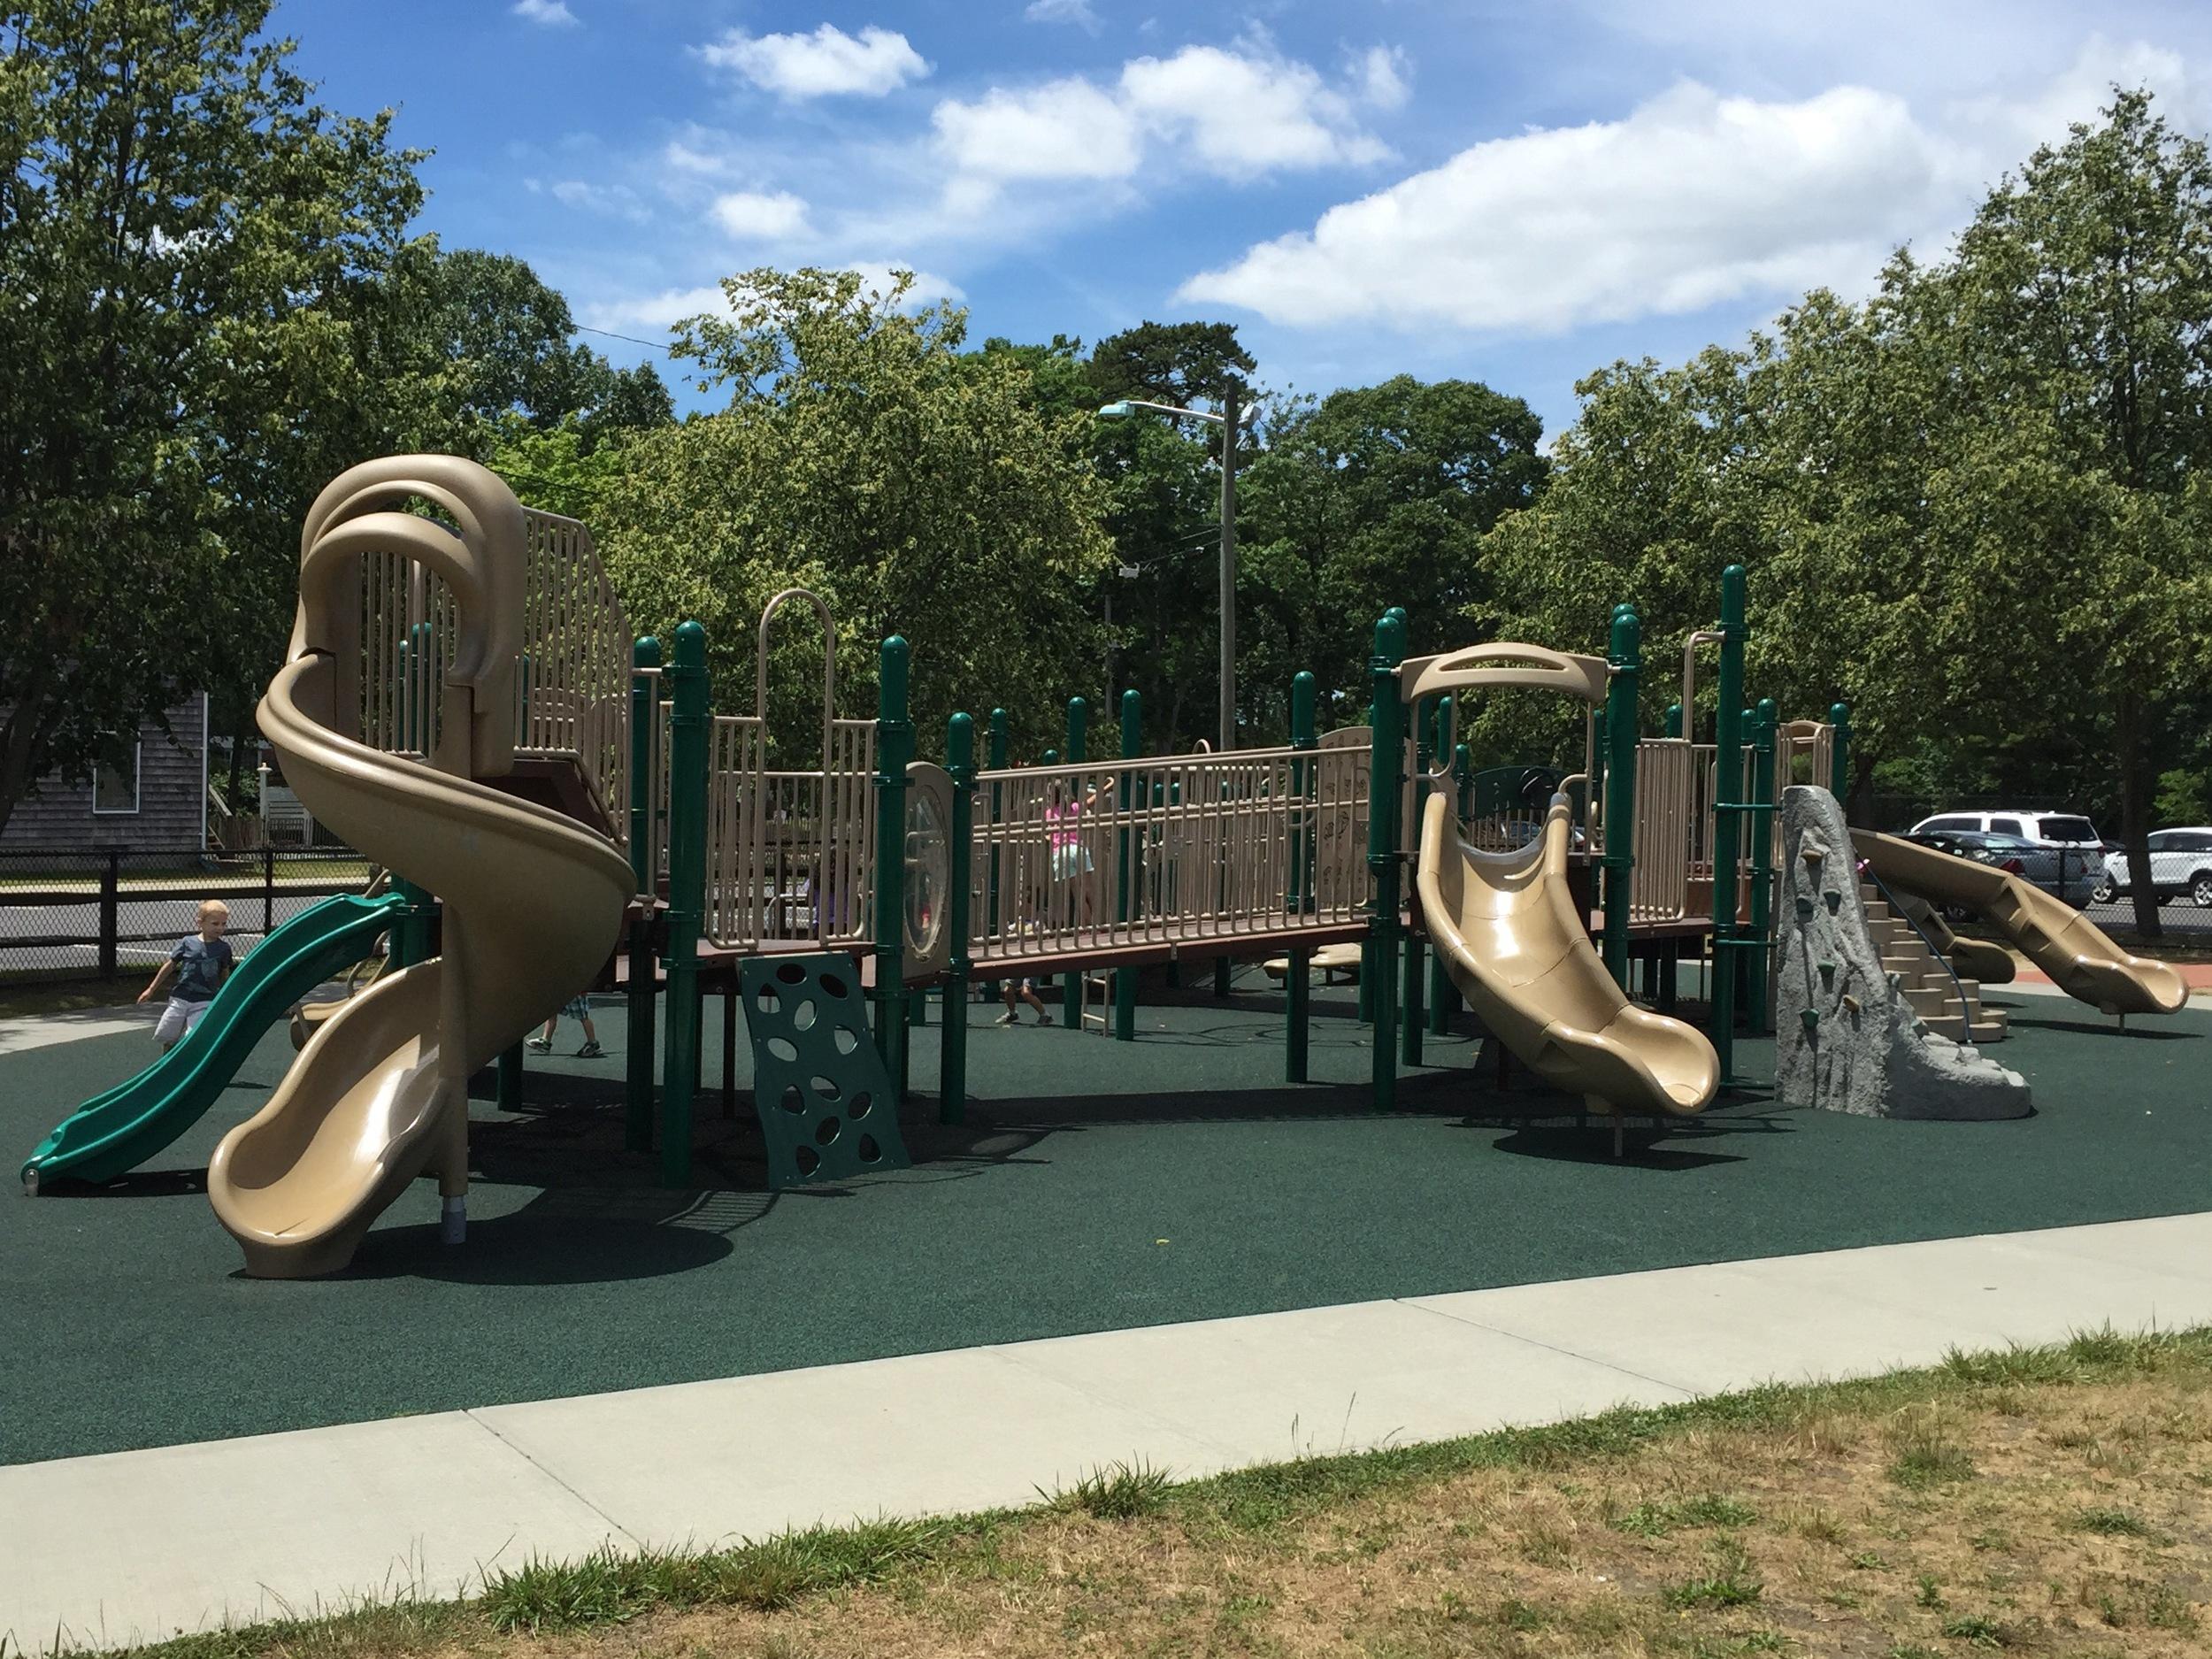 Playground at Brookwood Hall Park